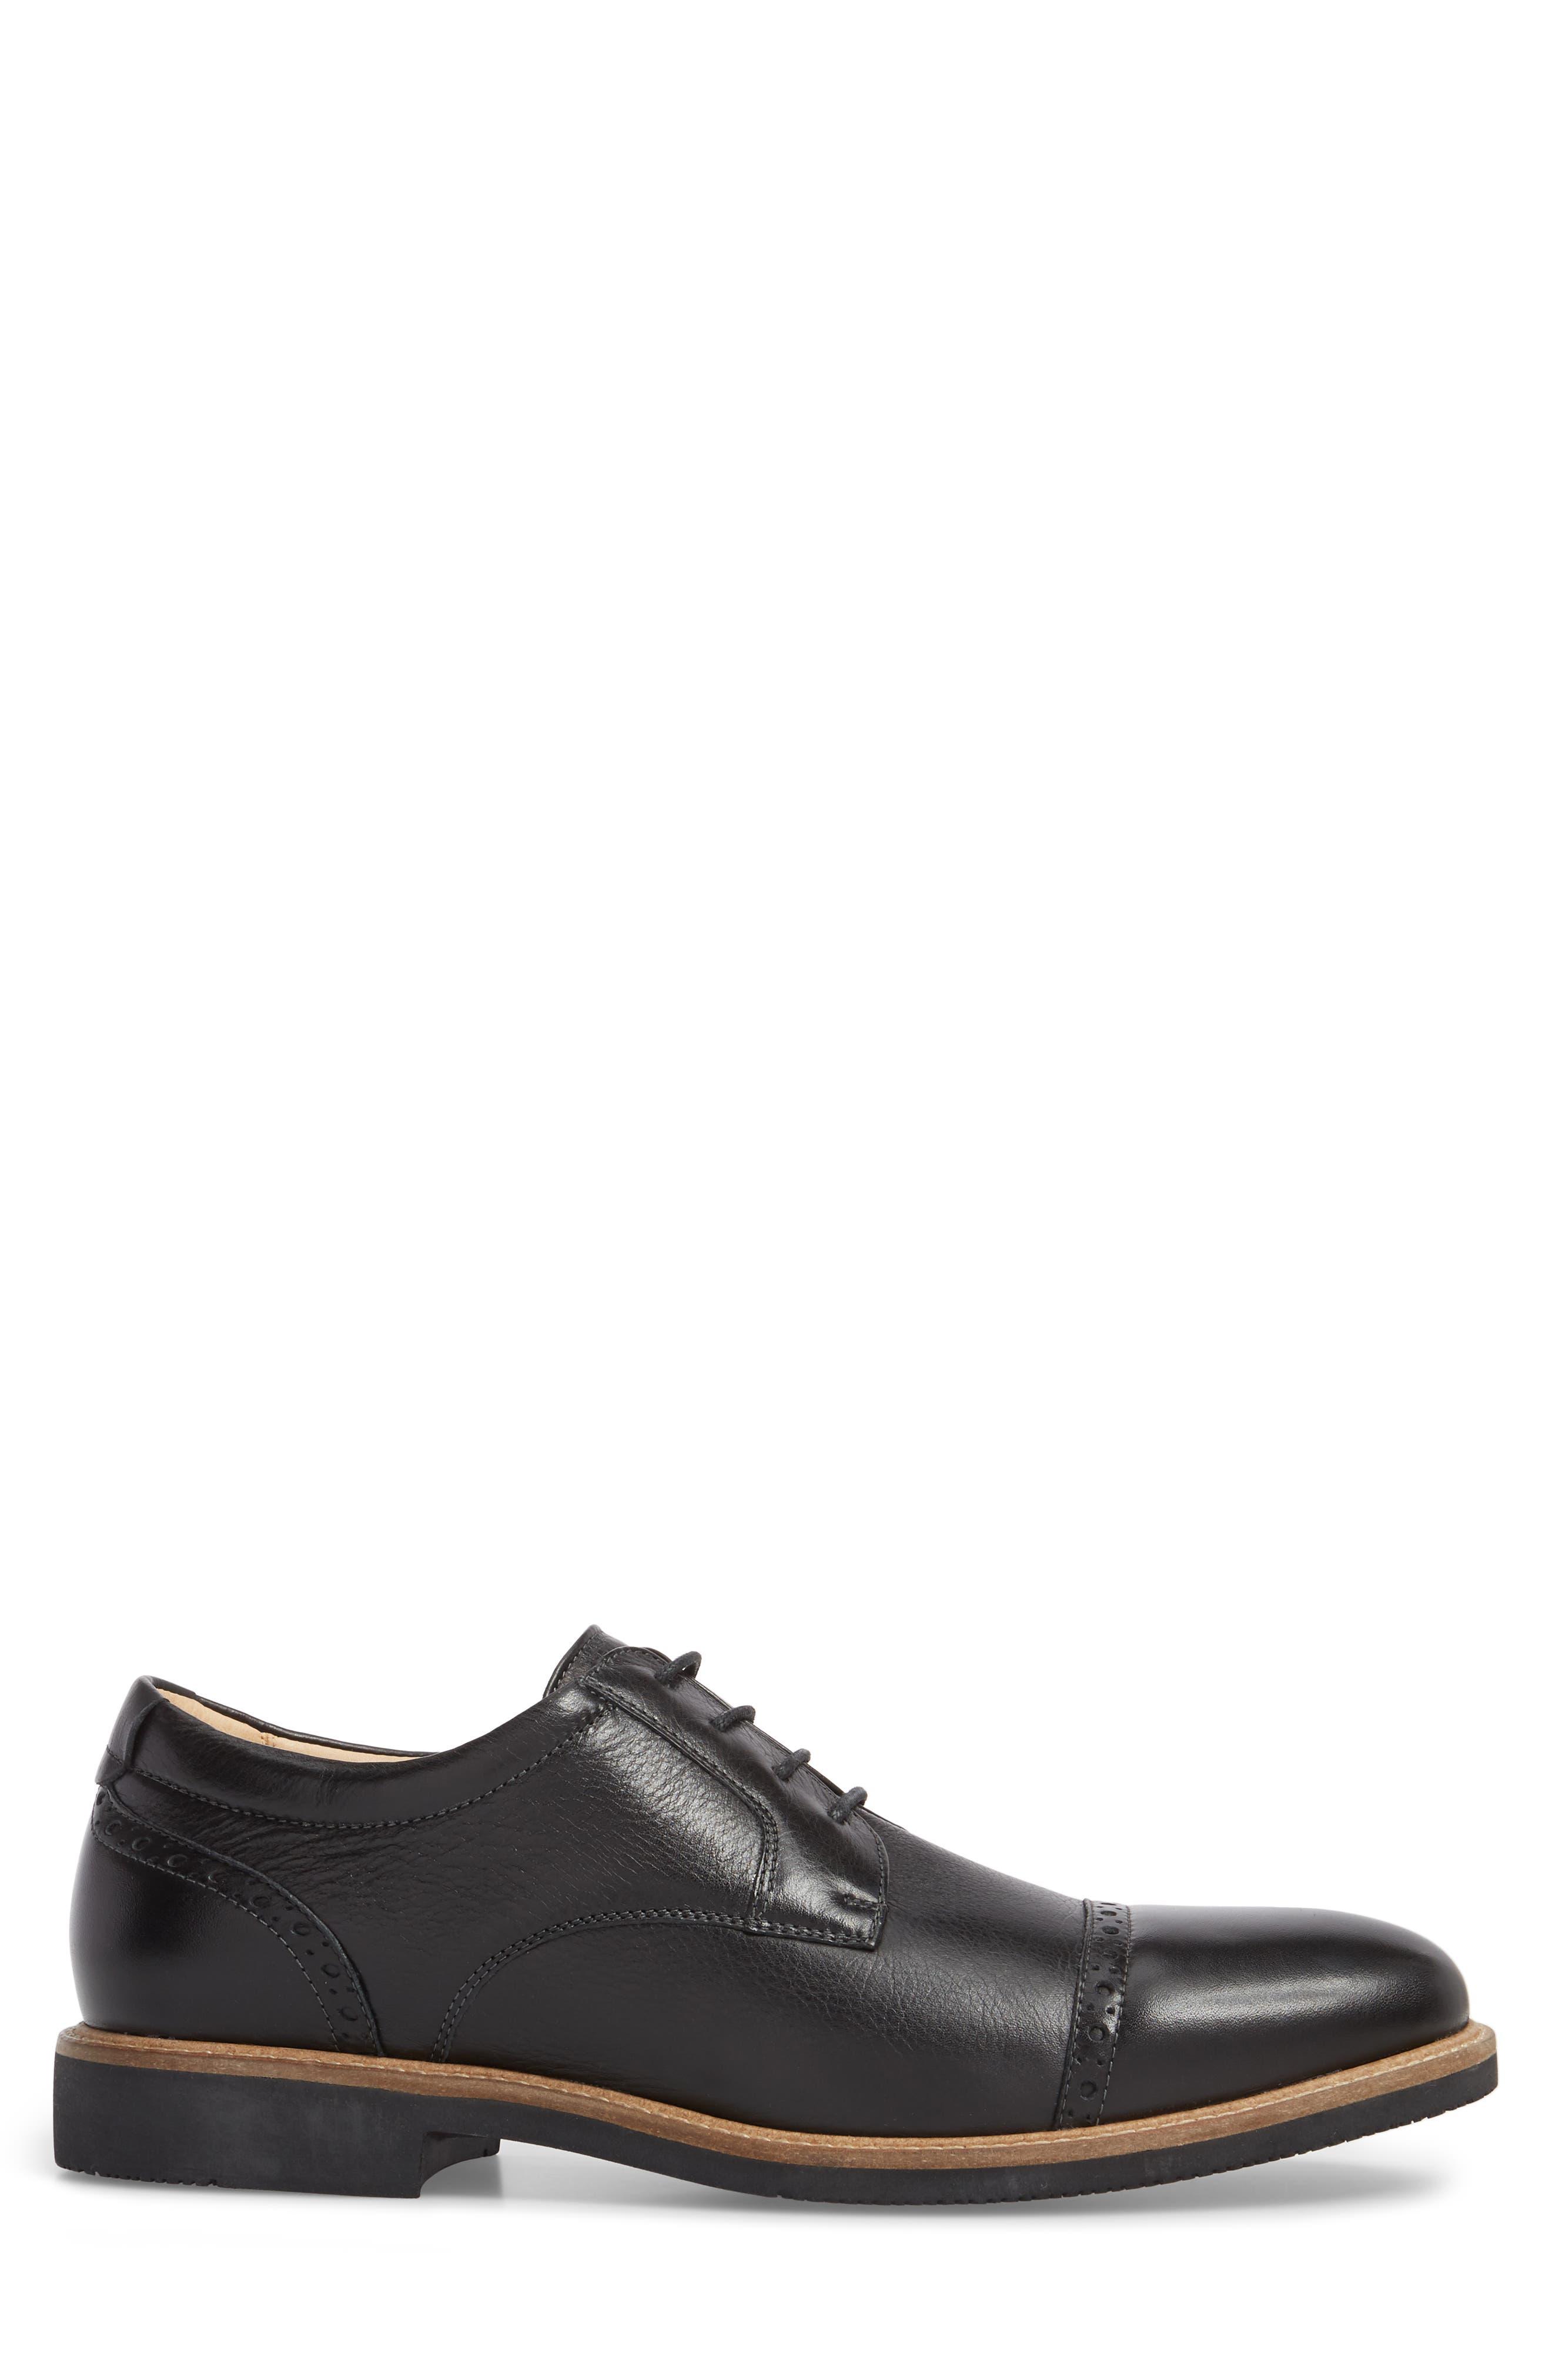 Barlow Cap Toe Derby,                             Alternate thumbnail 3, color,                             Black Leather